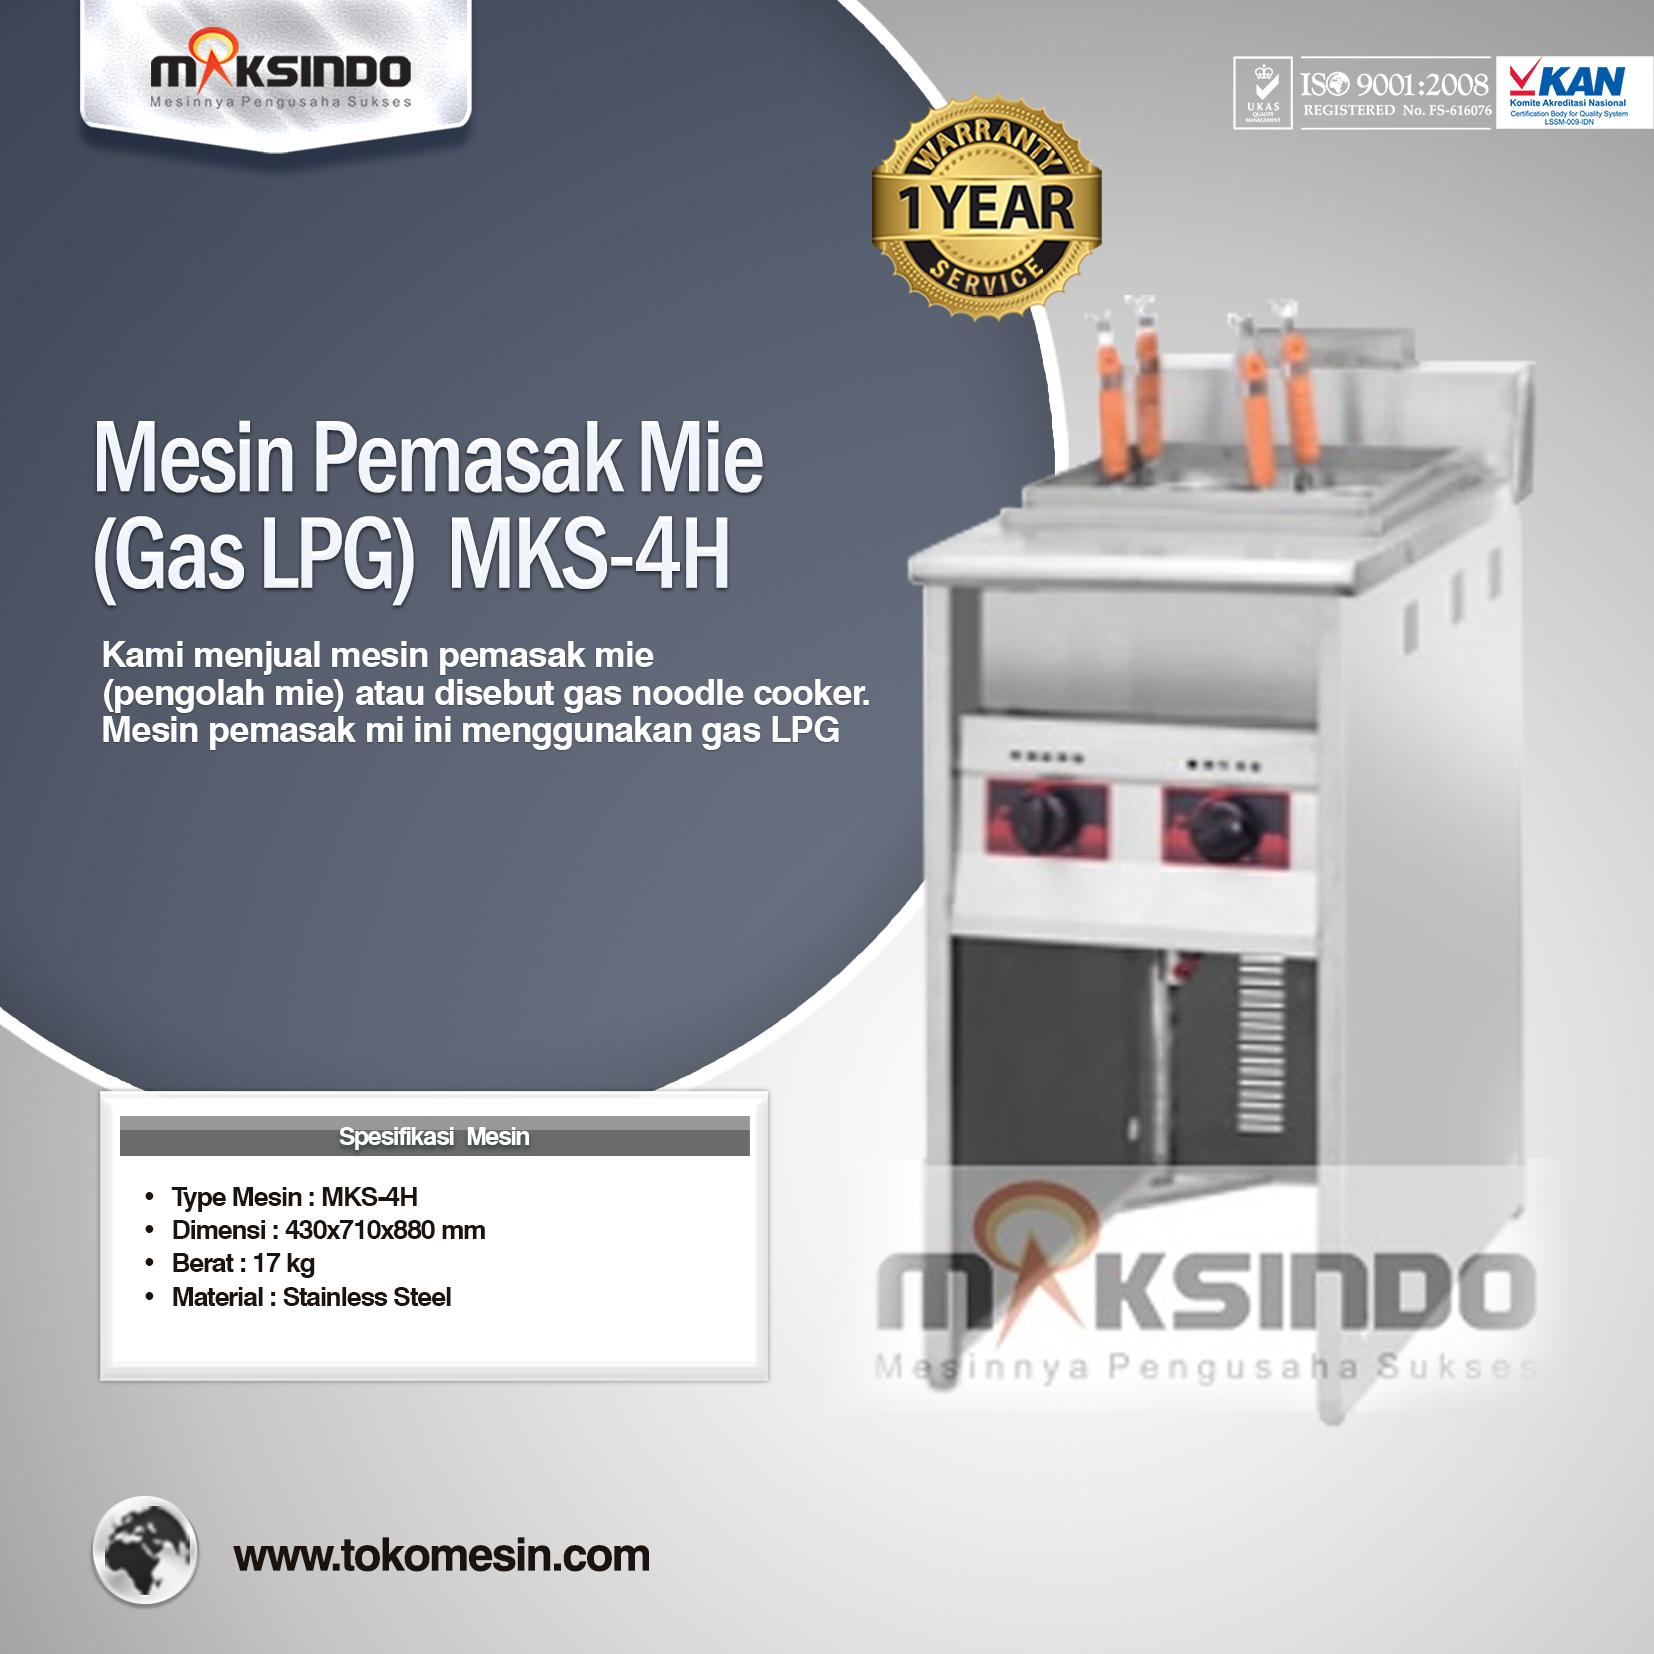 Mesin Pemasak Mie (Gas LPG) MKS-4H